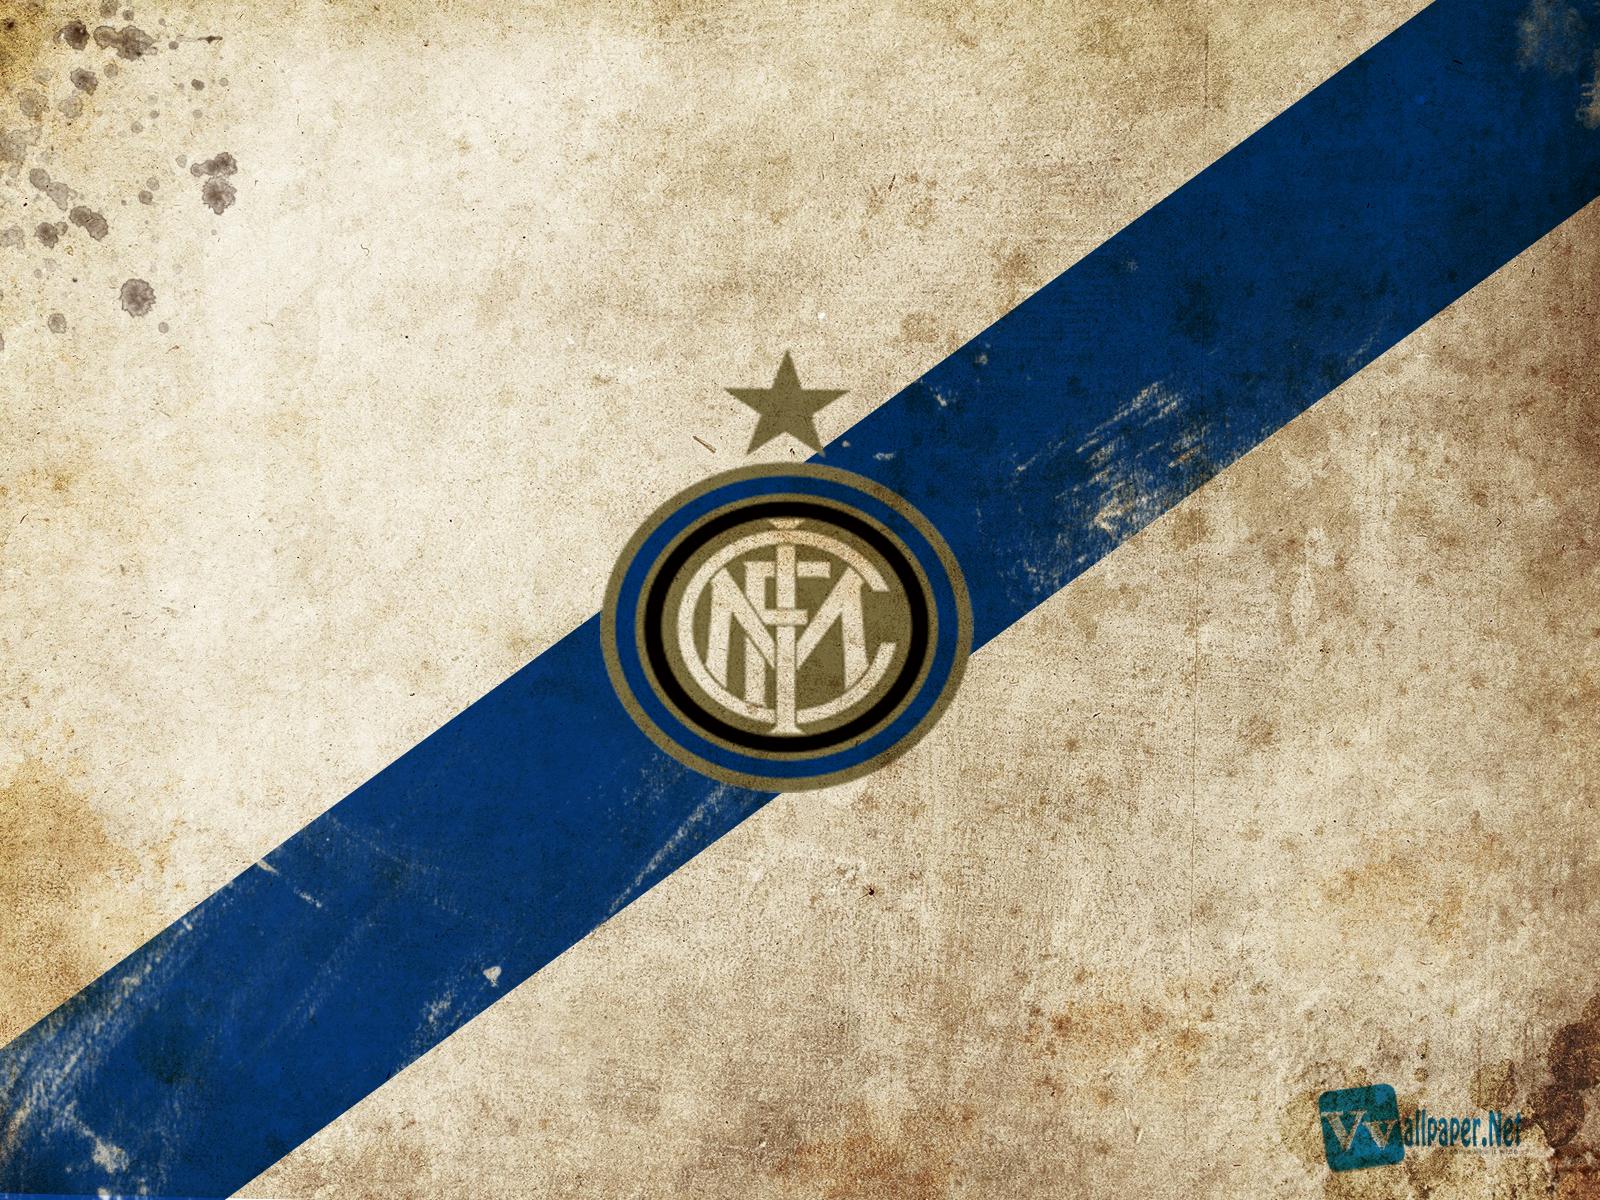 1200x1600 Wallpaper Hd: Inter Milan Logo HD Wallpapers